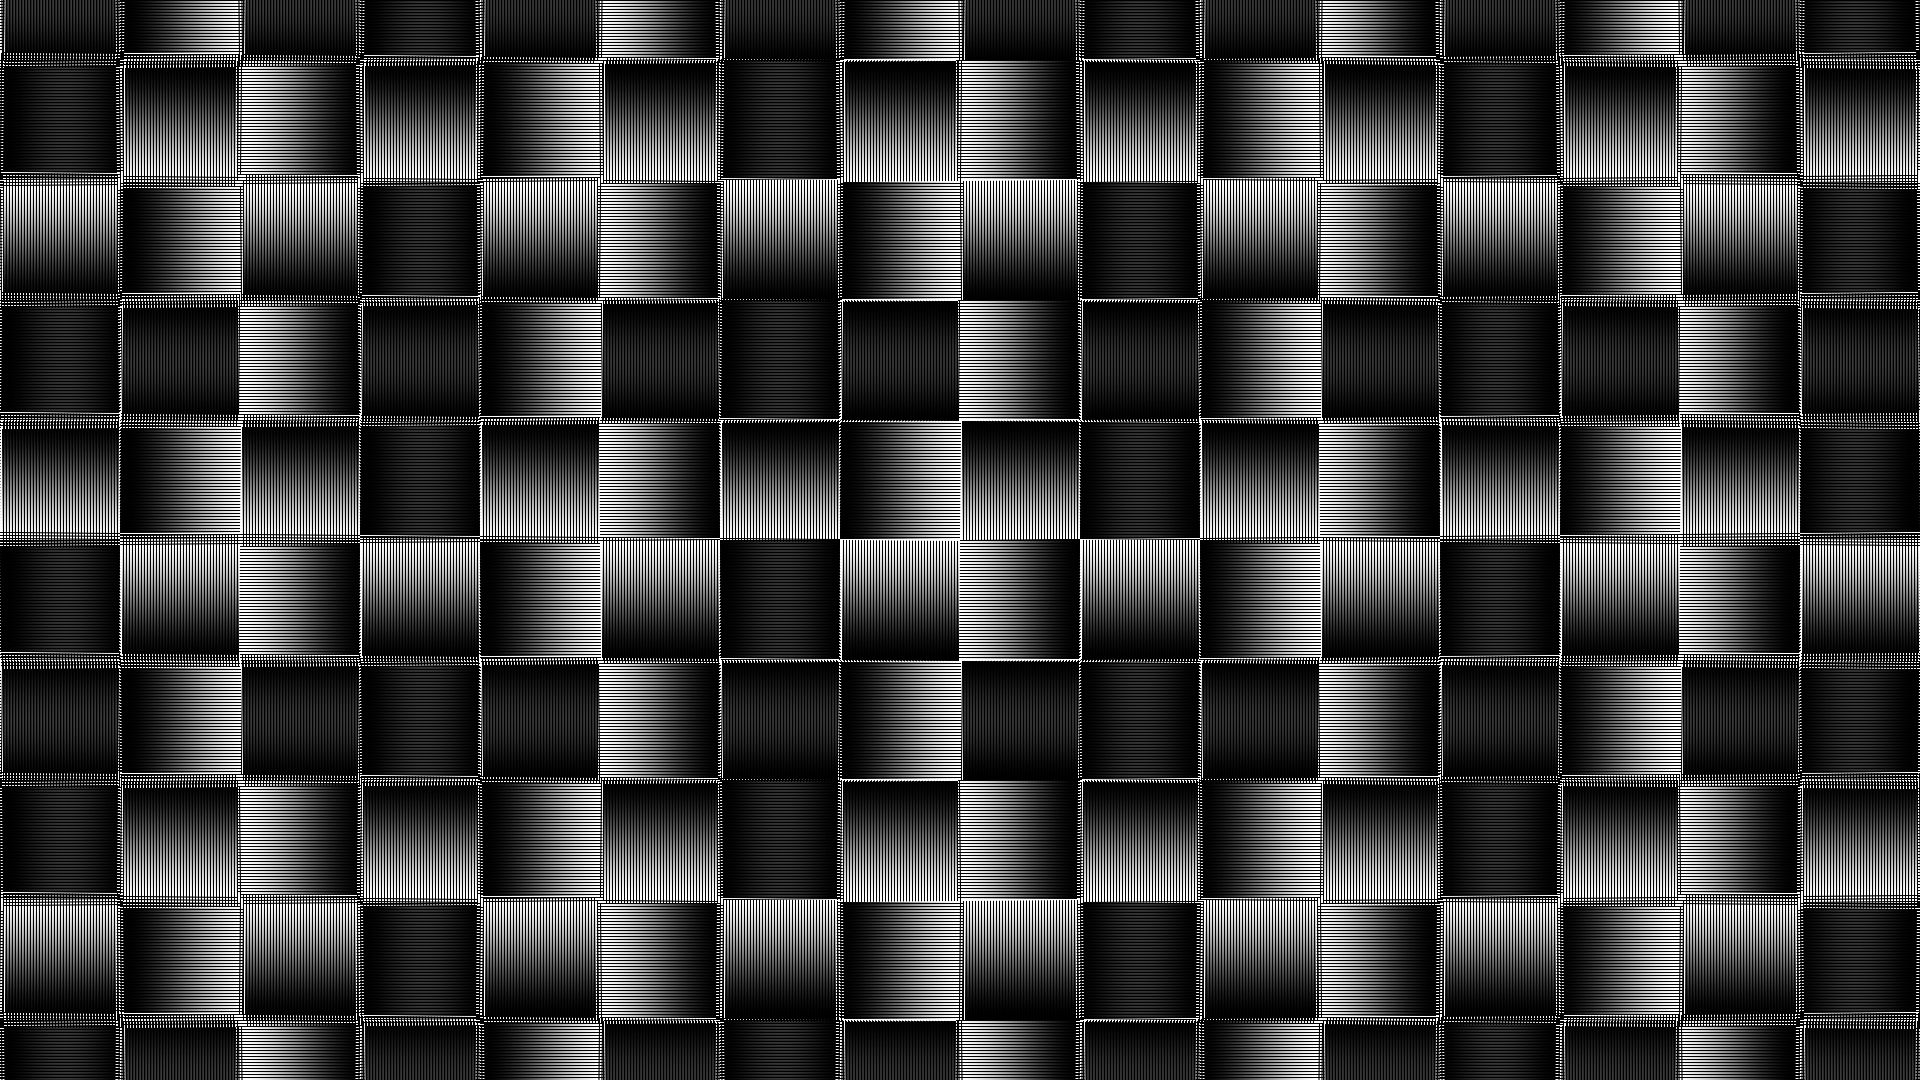 How To Make A Basket Weave Effect : Moire basket weave by gamemaster on deviantart